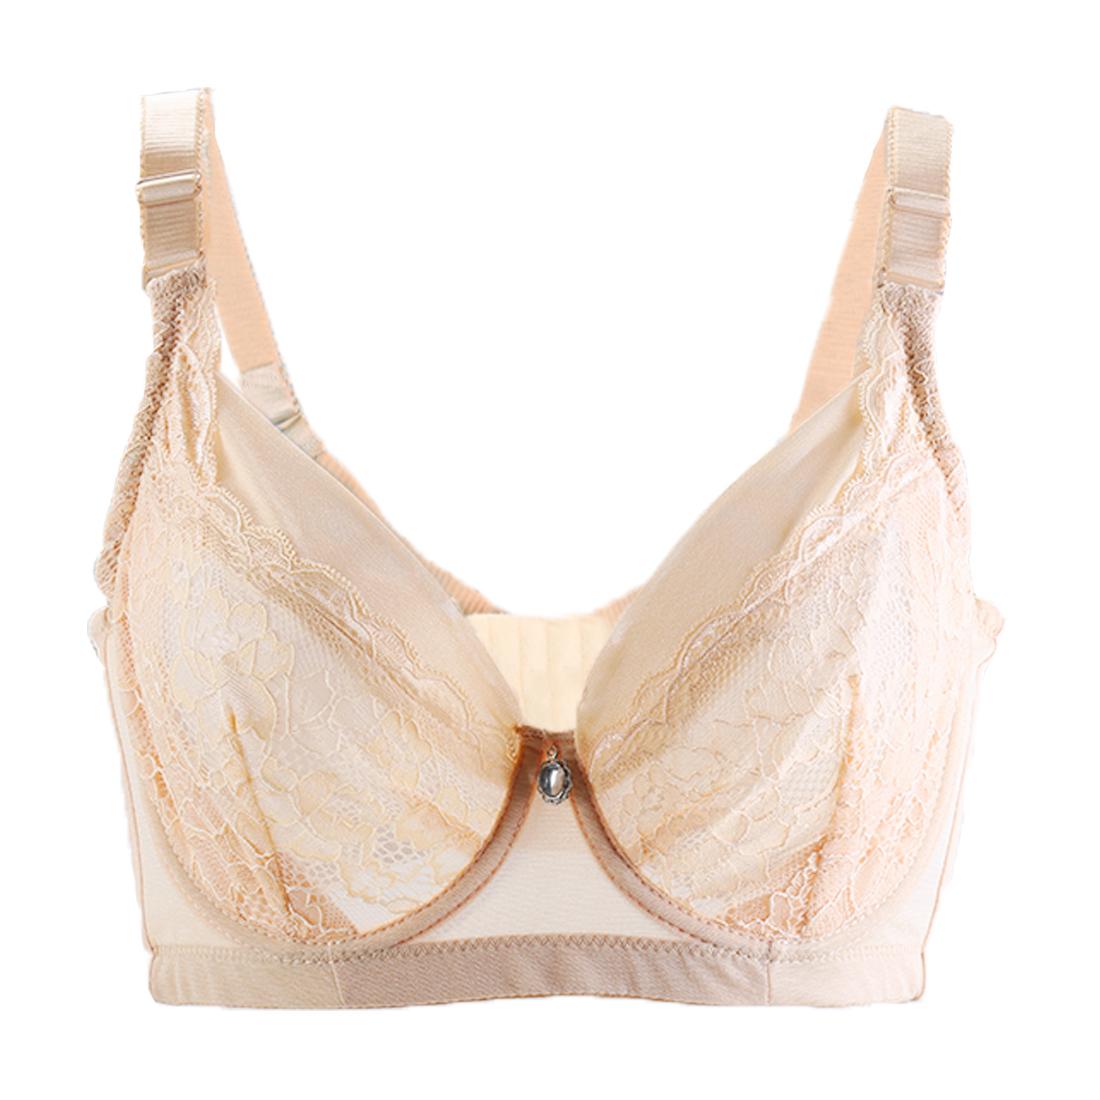 Women Semitransparent Push Up Lace Deco Thin Cup Underwire Bra Beige 38/85